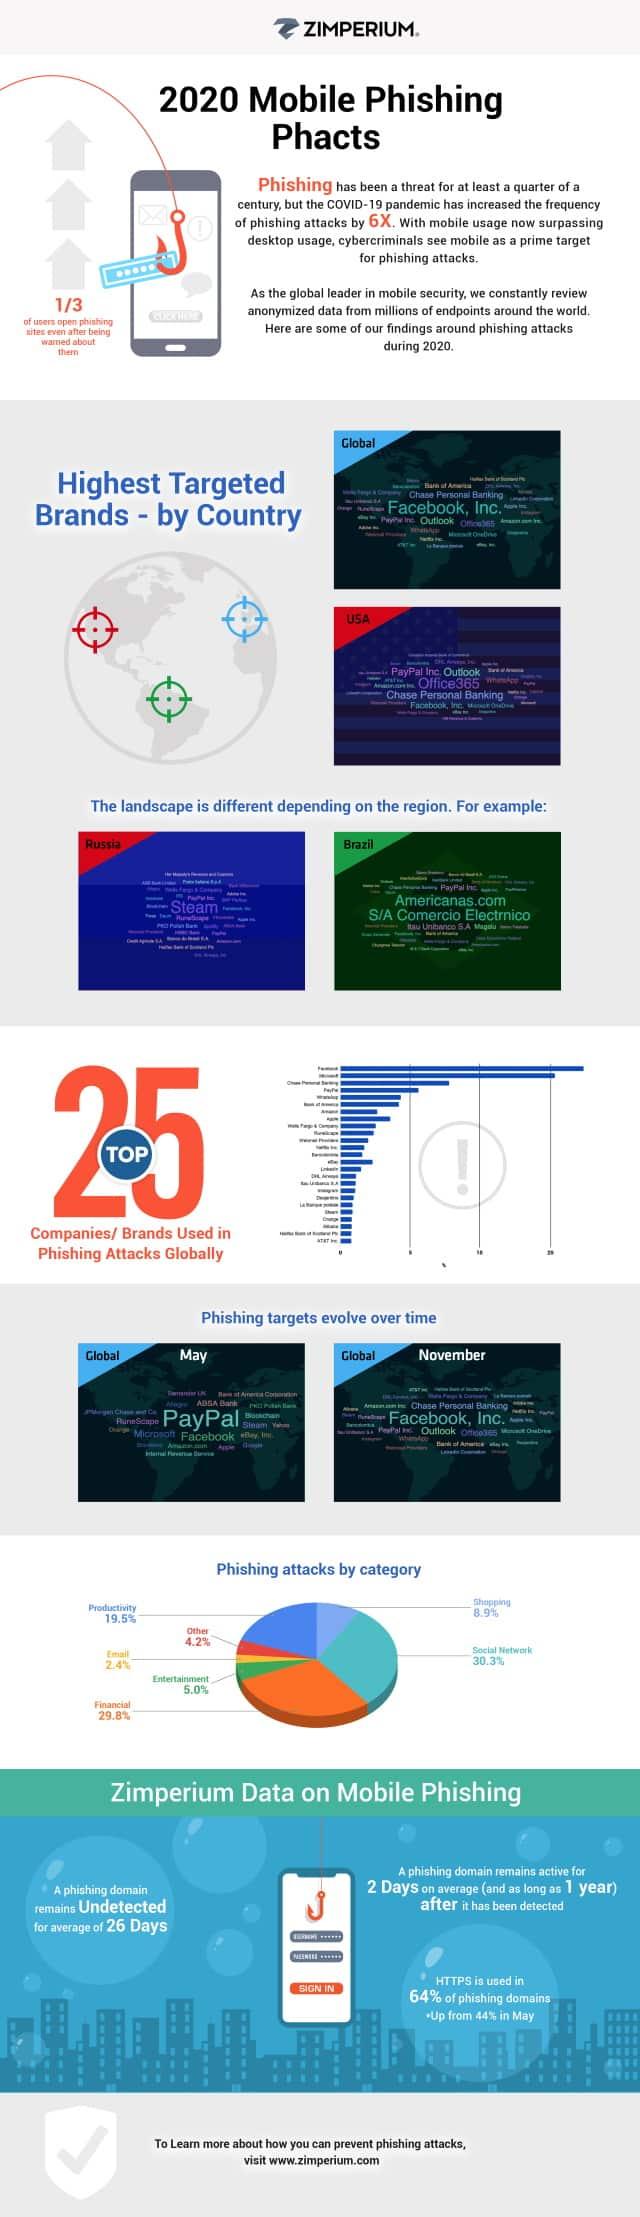 mobile prishing infographic